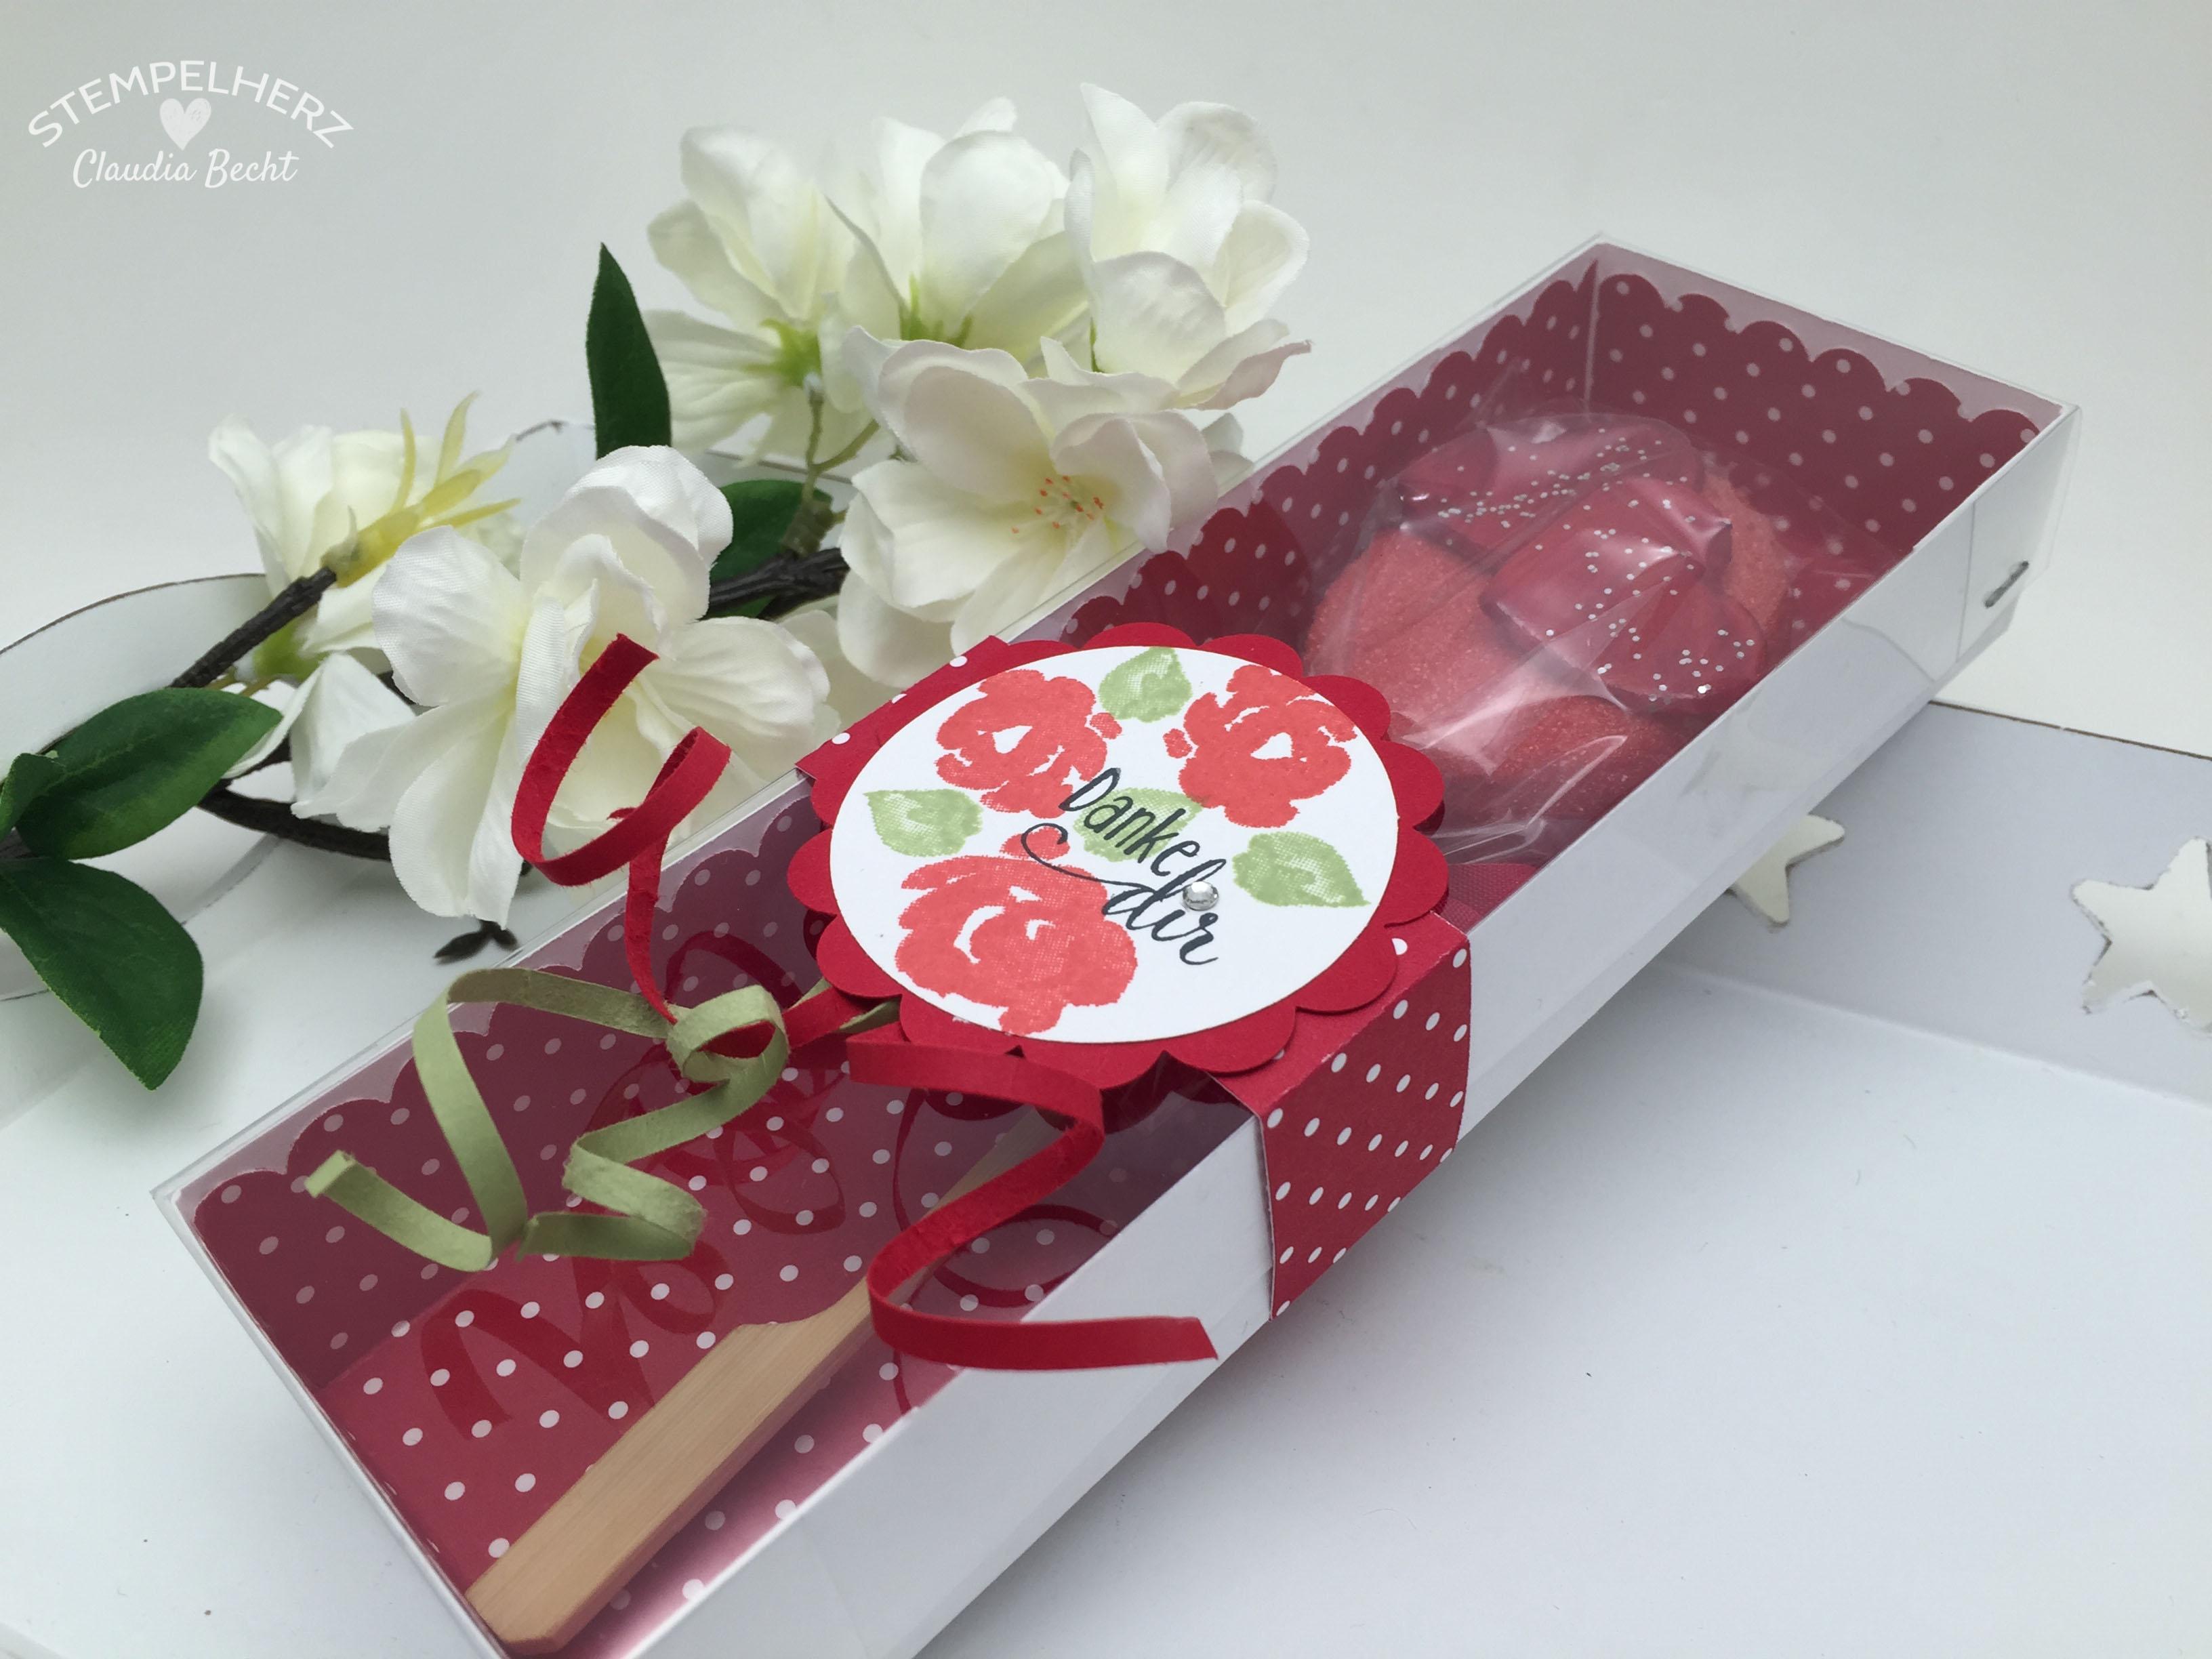 Stampin Up-Stempelherz-Verpackung-Box-Verpackung Cake Pop-Muttertag-Painted Petals-Cake Pop Verpackung Danke Dir zum Muttertag 04